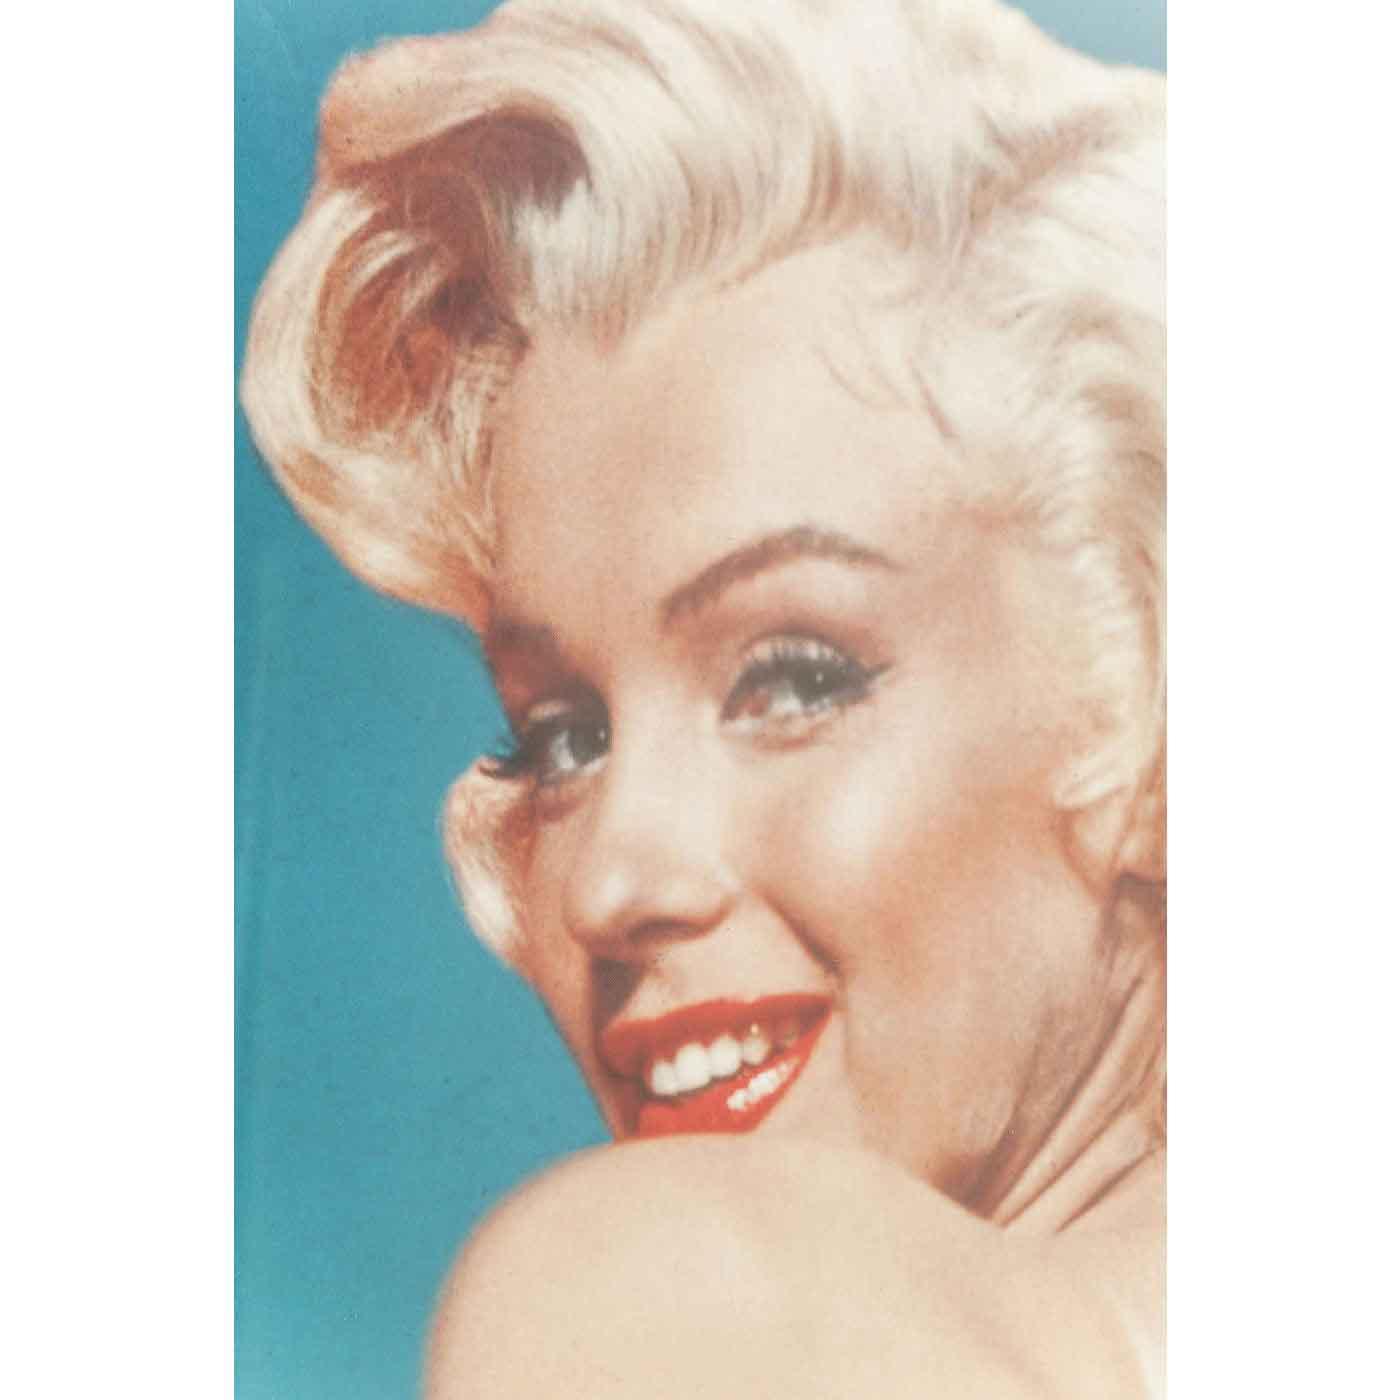 Plakat m. Ramme, Fabulous 64x94cm med Marilyn Monroe